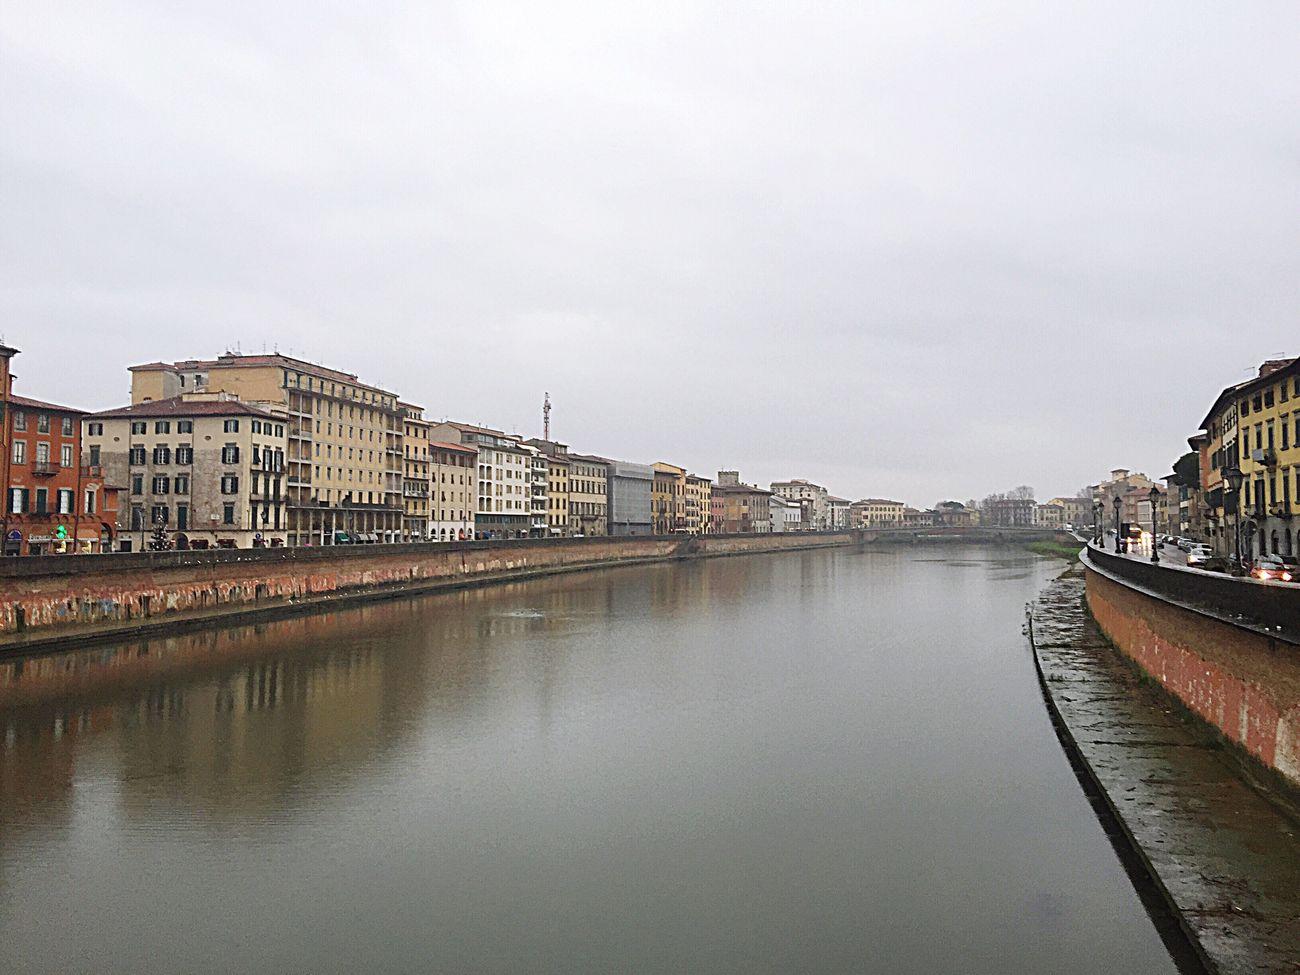 Da secoli passo di qui ... Arno  Italia Memories Pisa OpenEdit Eye4photography  Urbanexploration Rivers Italianeography Art Tuscany Tuscanygram Water Time To Reflect Fantastic View Slowlife Ricordi